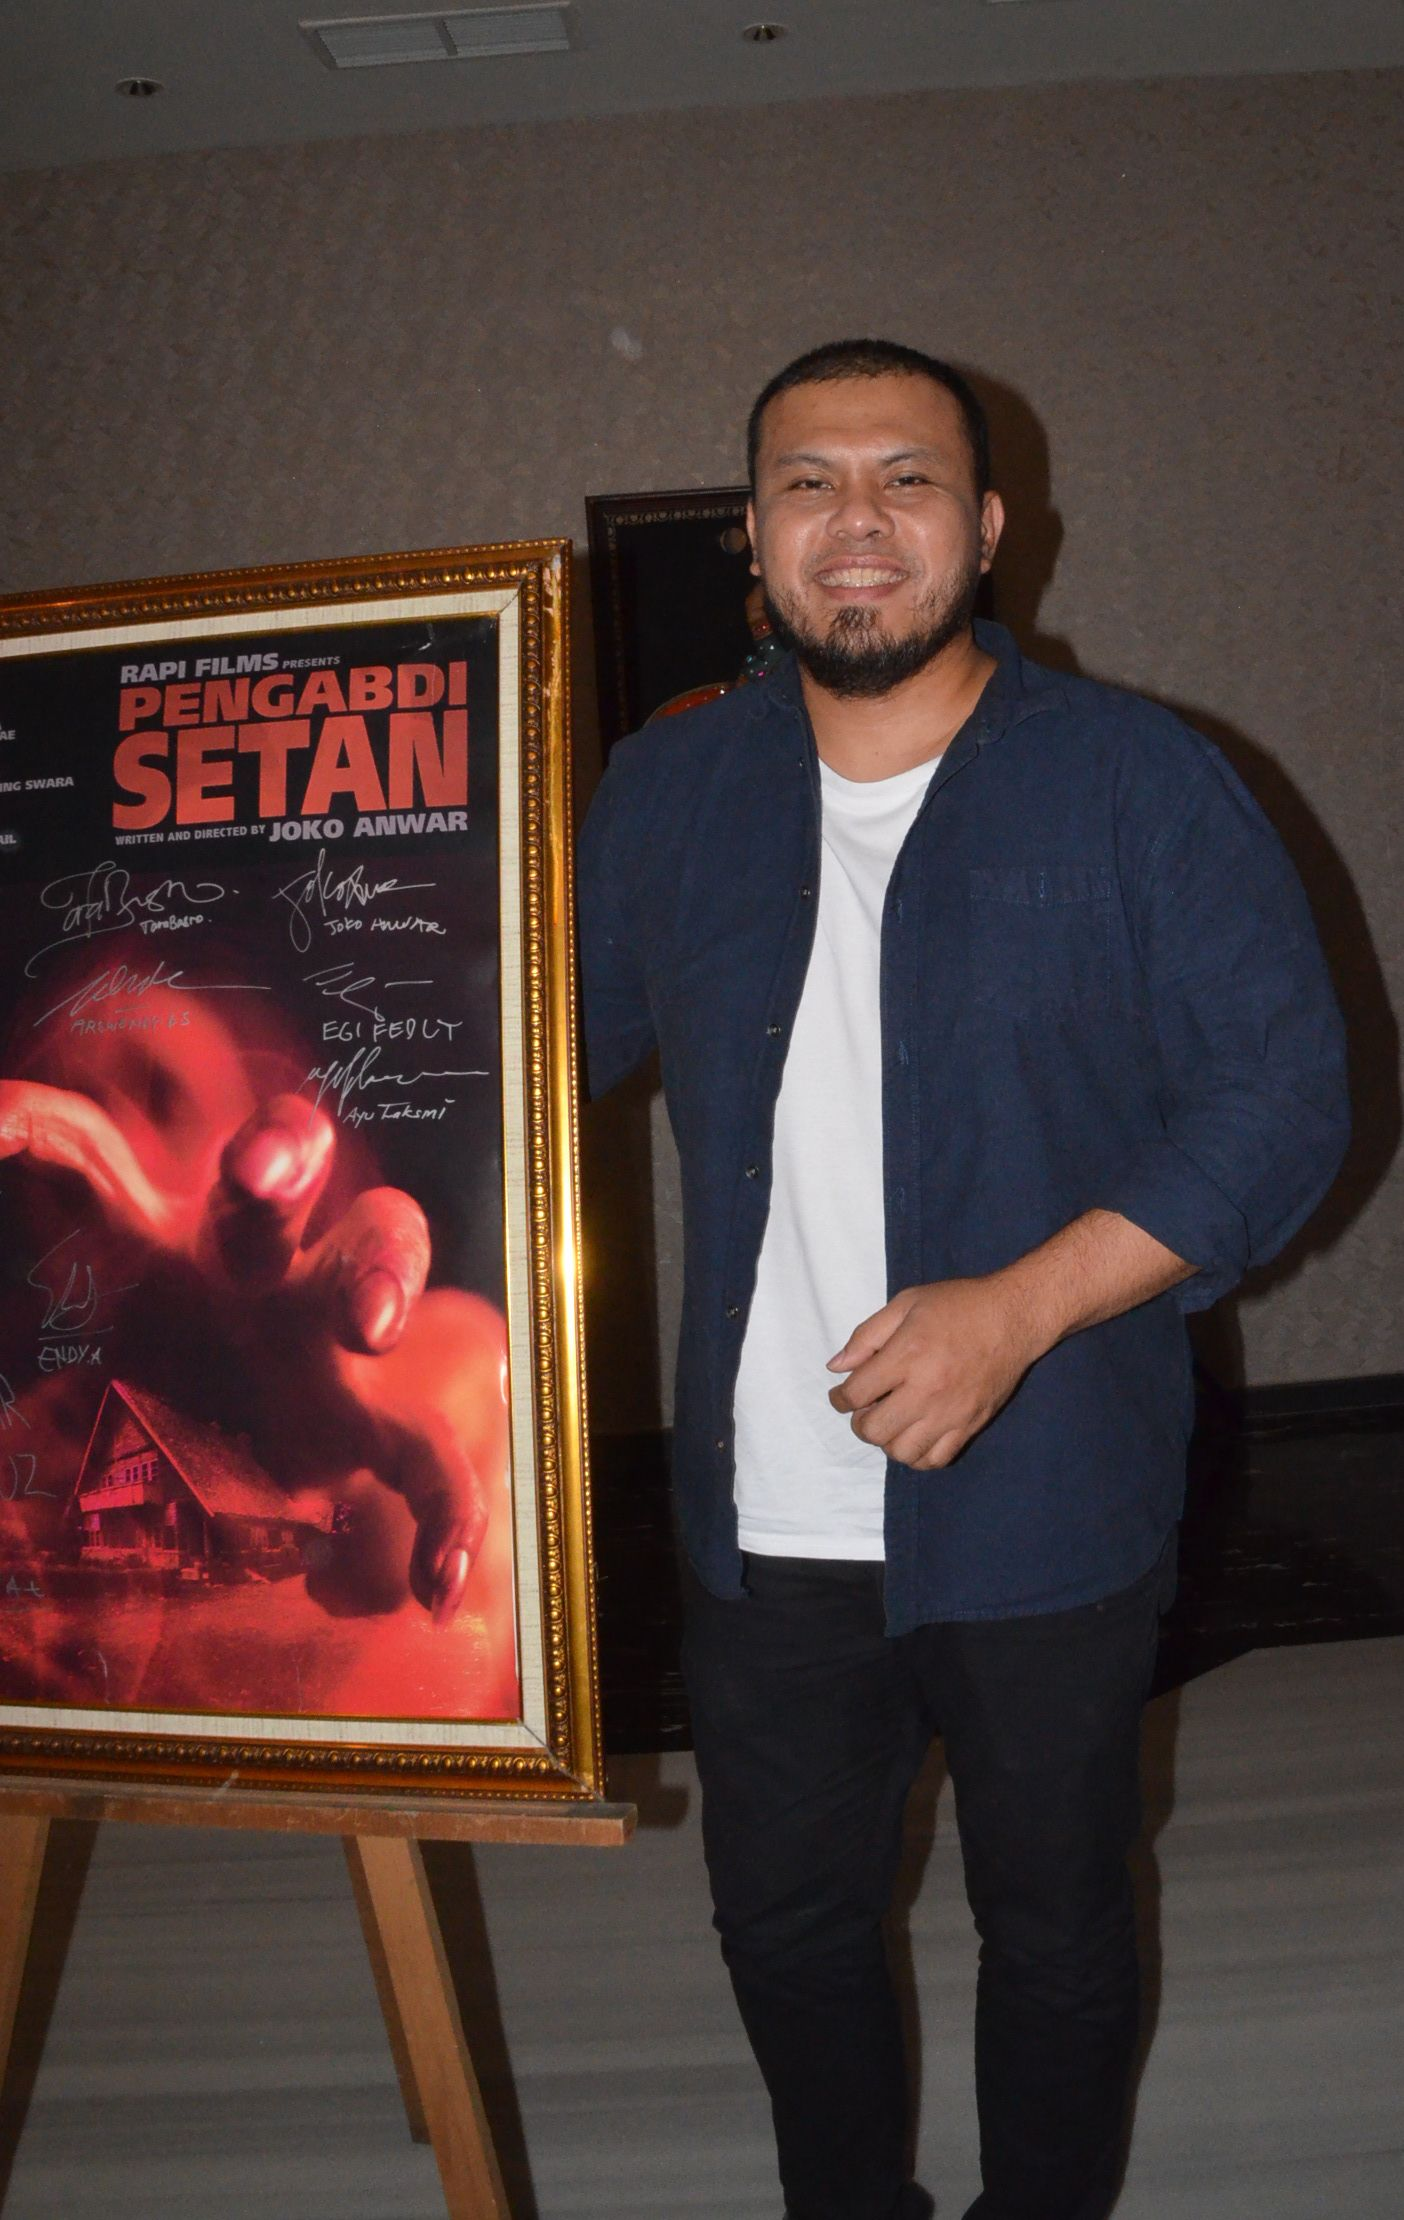 Joko Anwar 'Remak' Film Pengabdi Setan